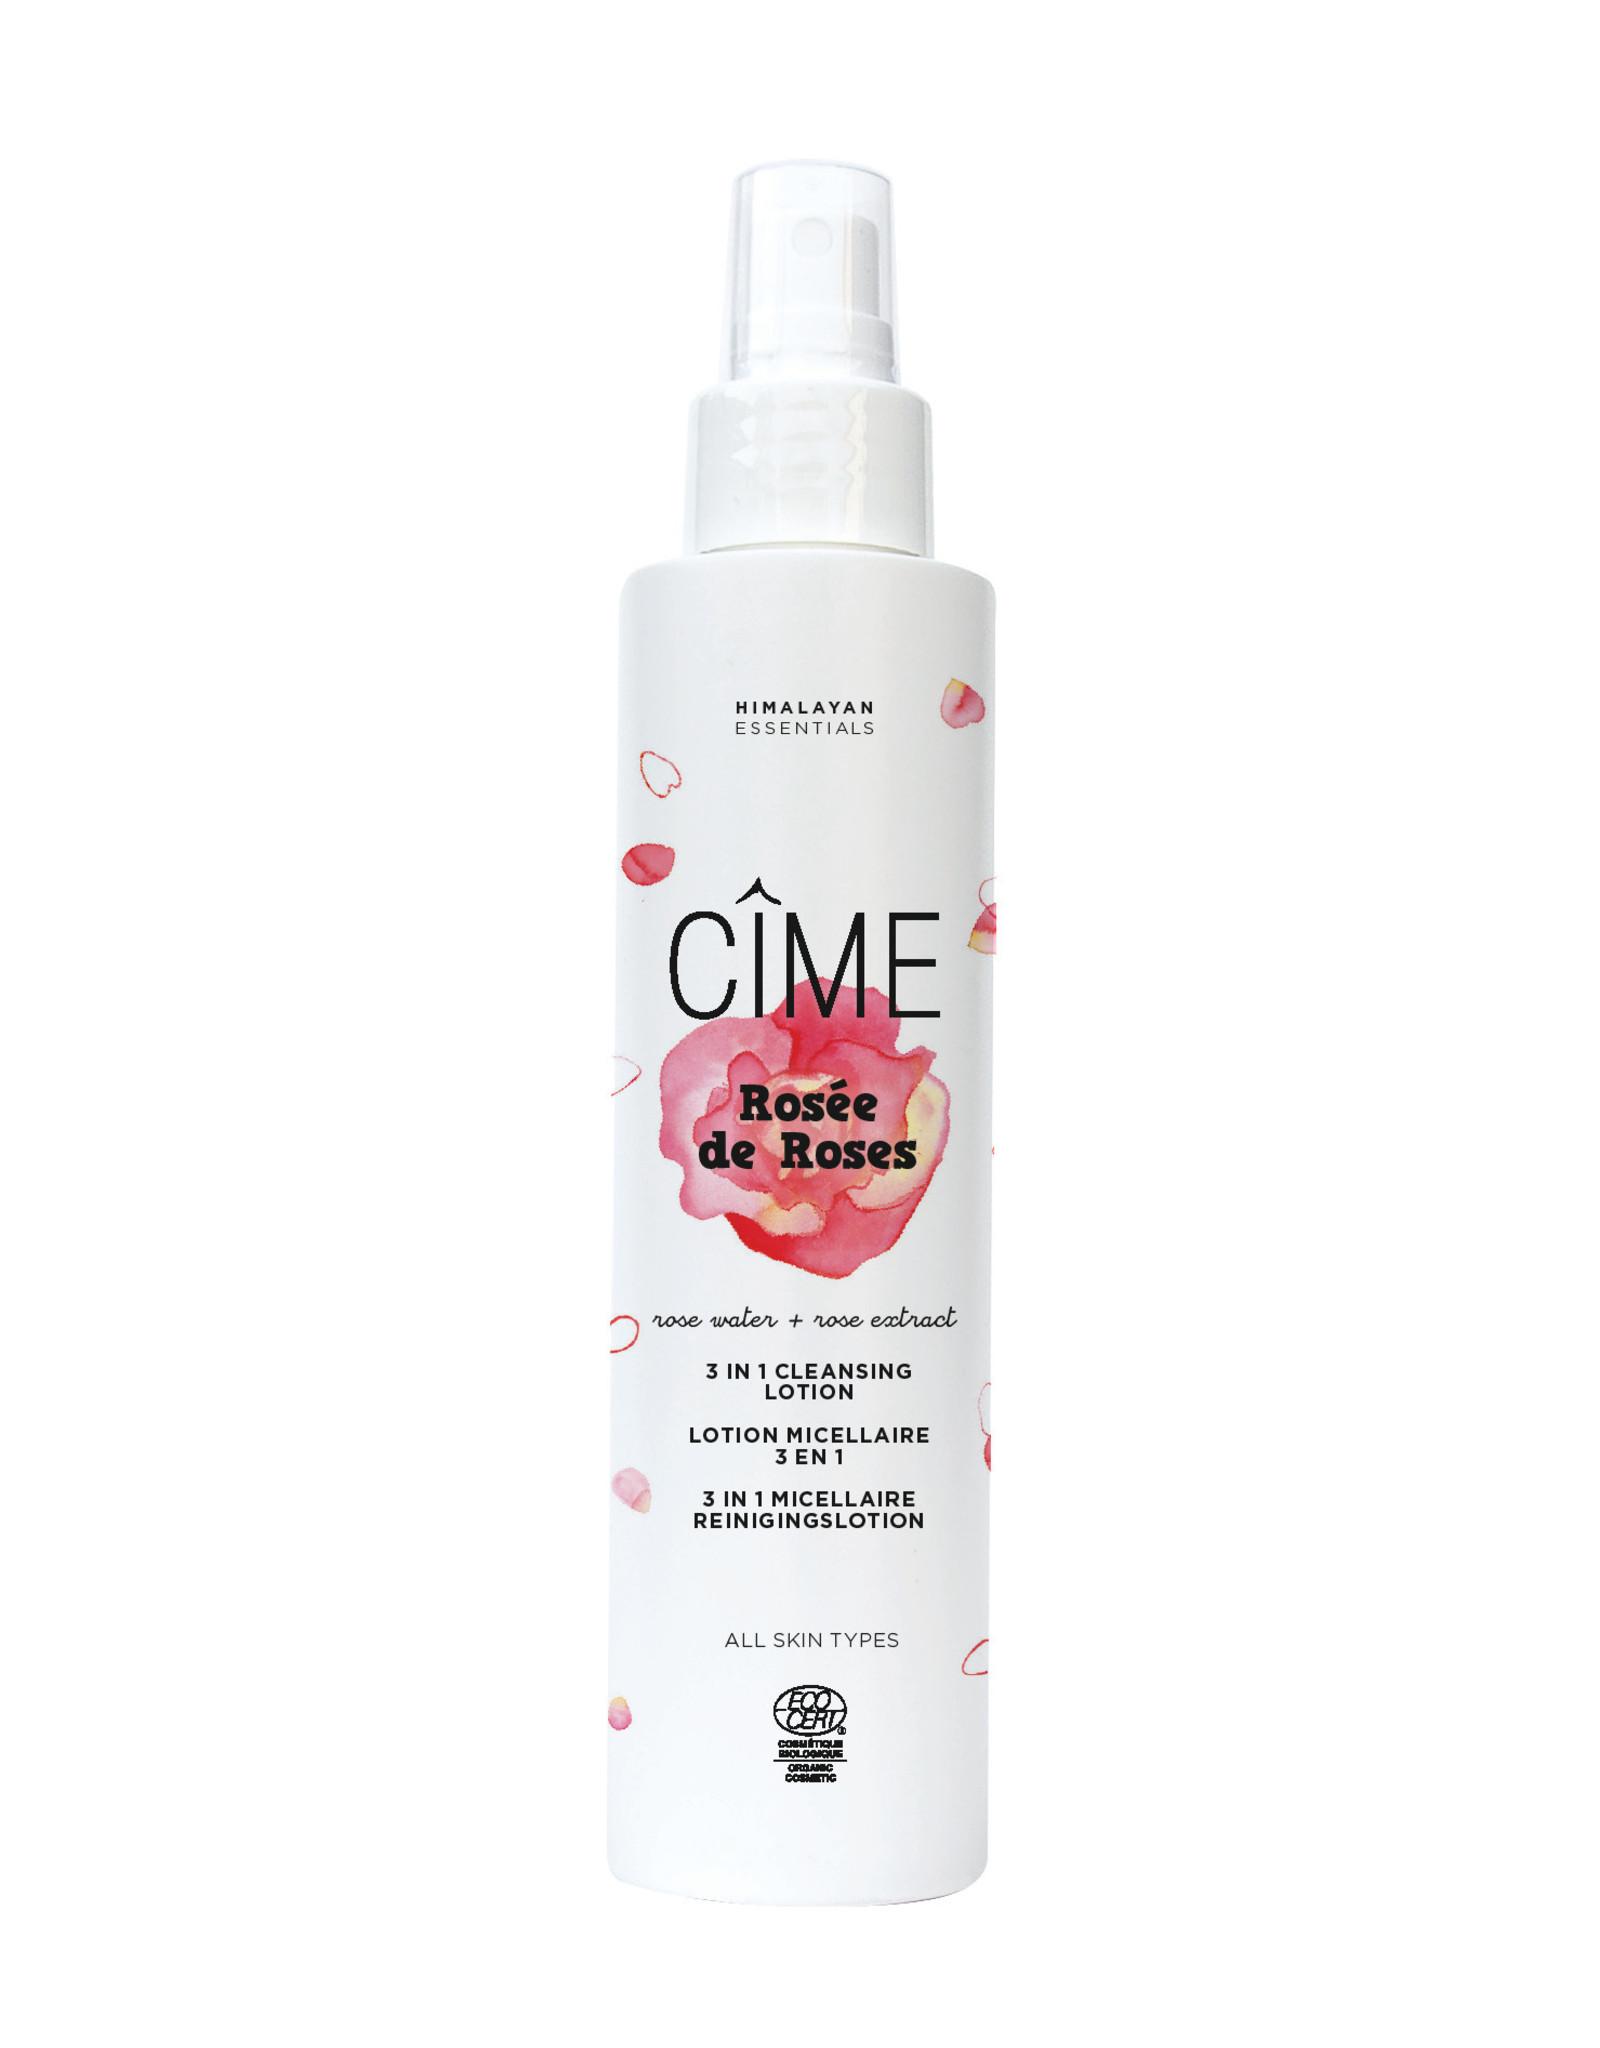 Cime Rosée de Roses - 3 in 1 Micellaire reinigingslotion 150ml